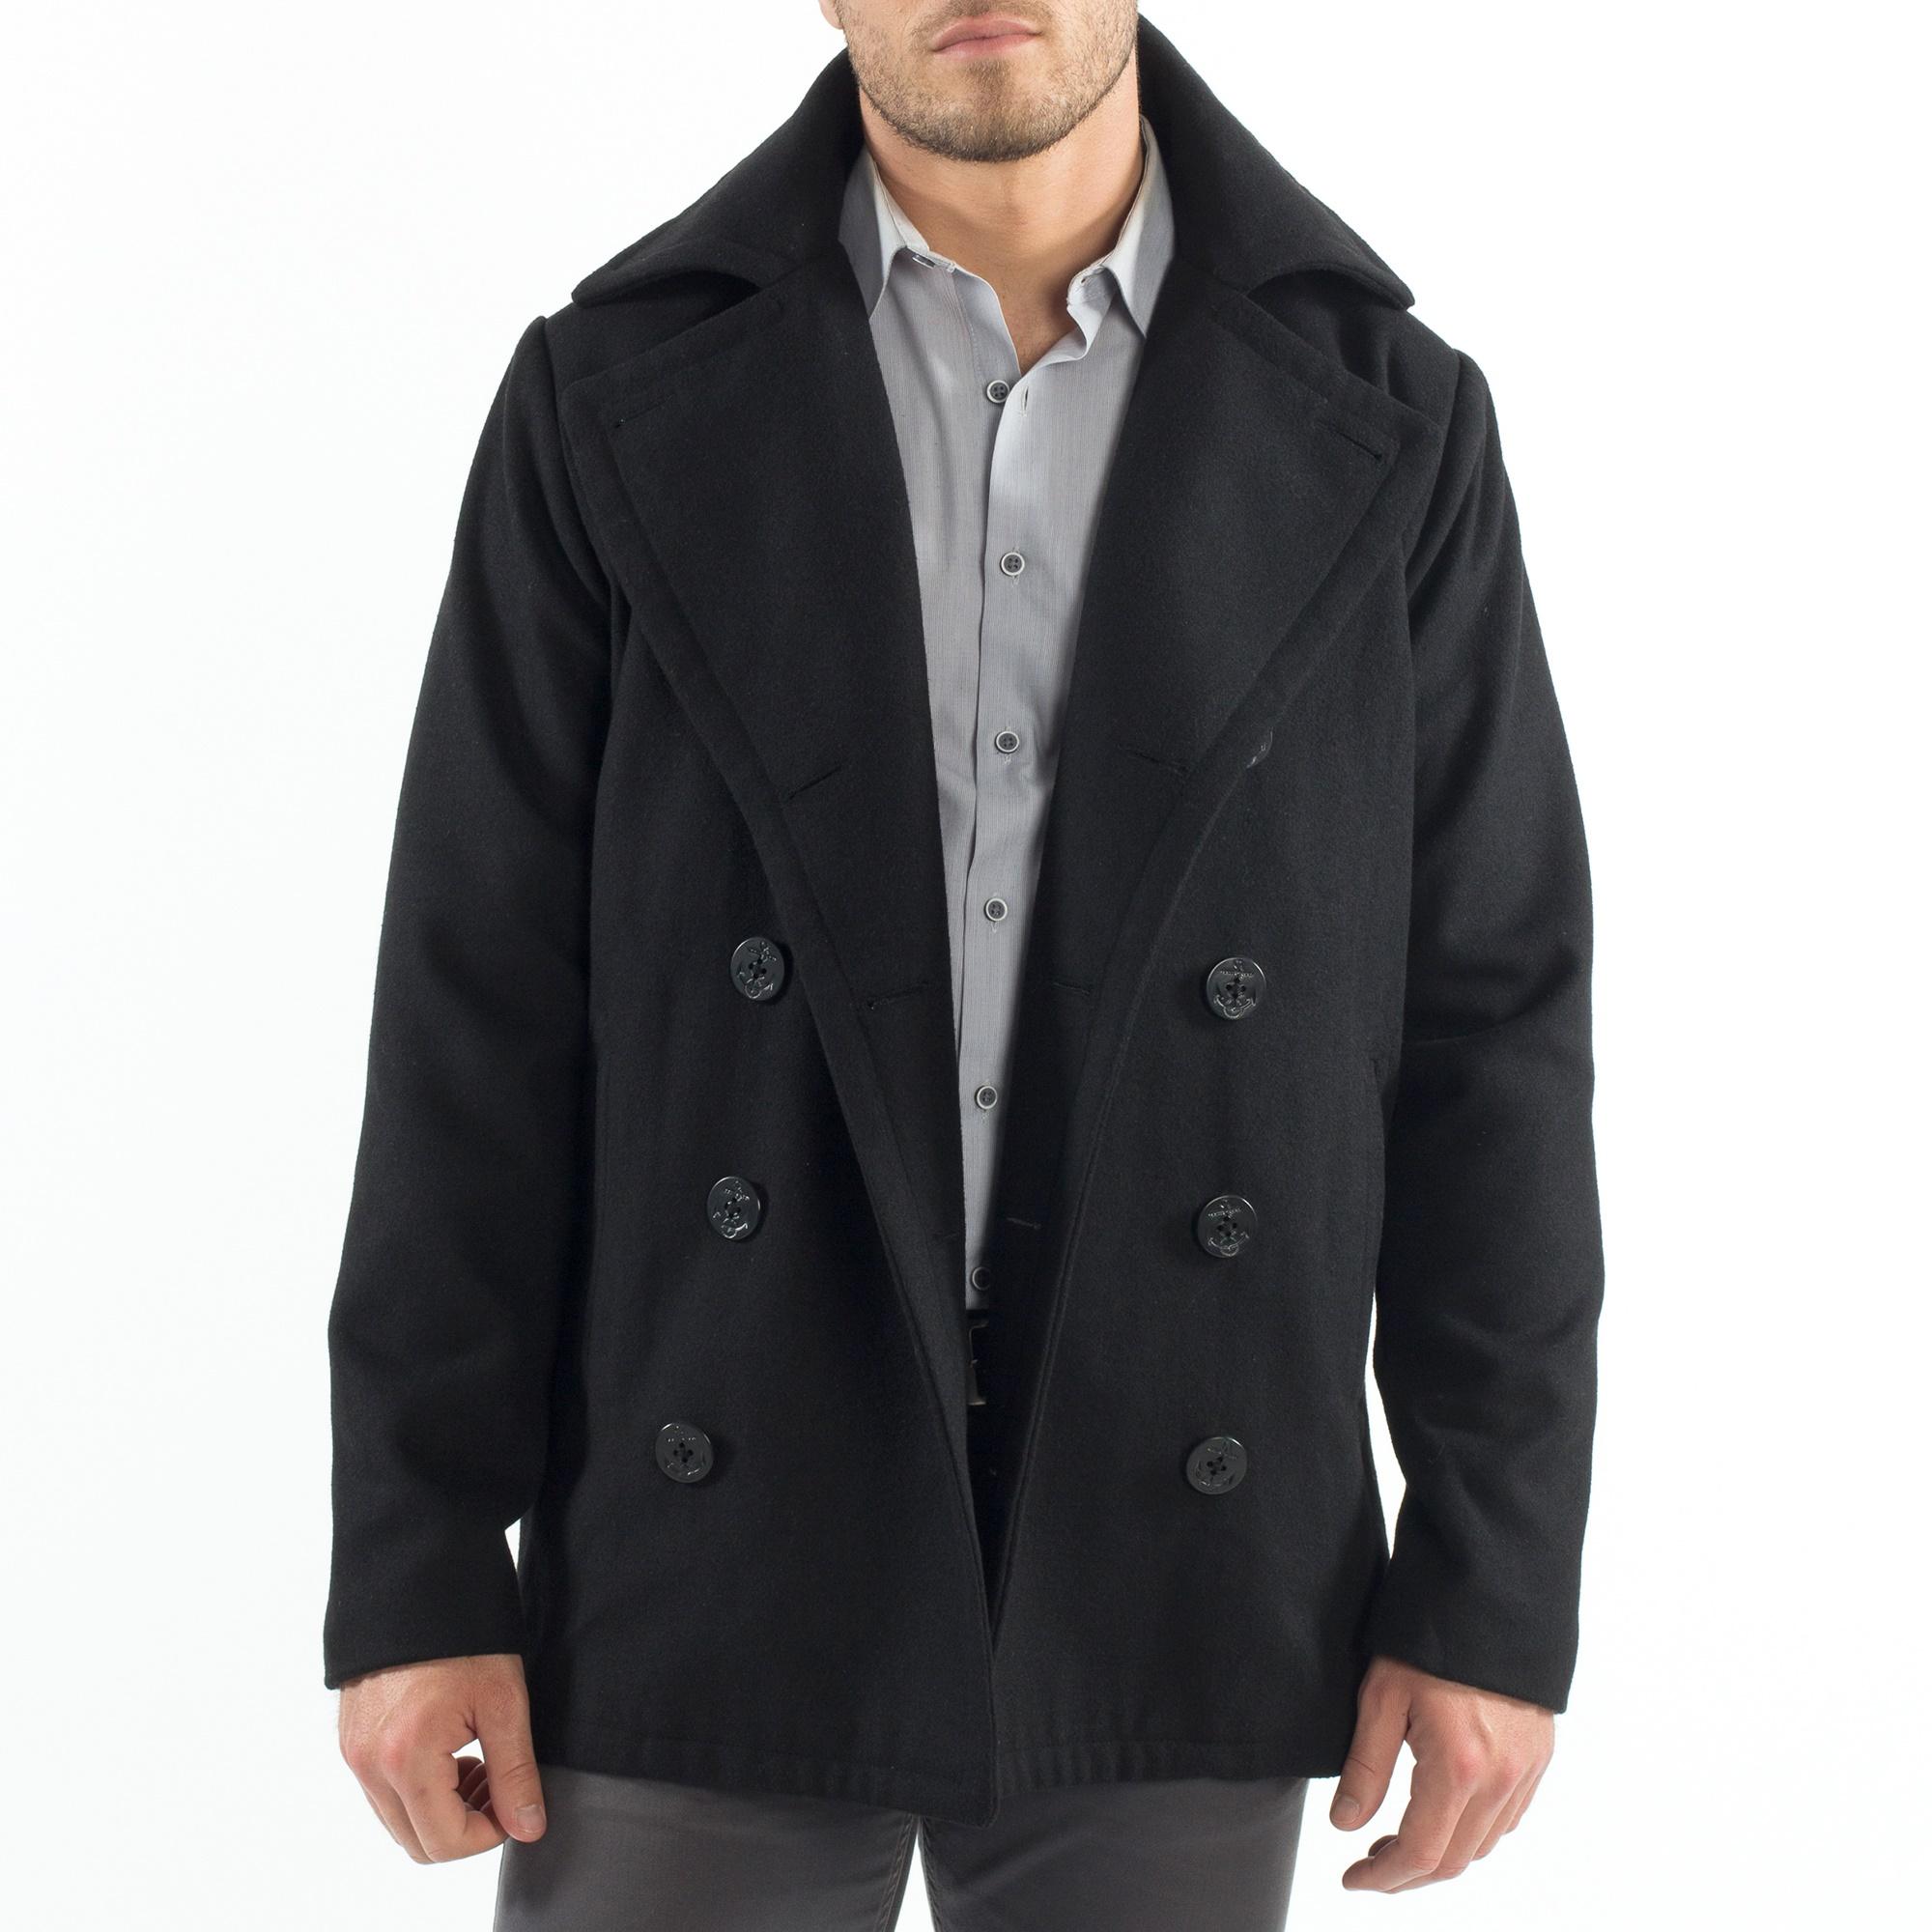 Alpine-Swiss-Mason-Mens-Wool-Blend-Pea-Coat-Jacket-Double-Breasted-Dress-Coat thumbnail 15